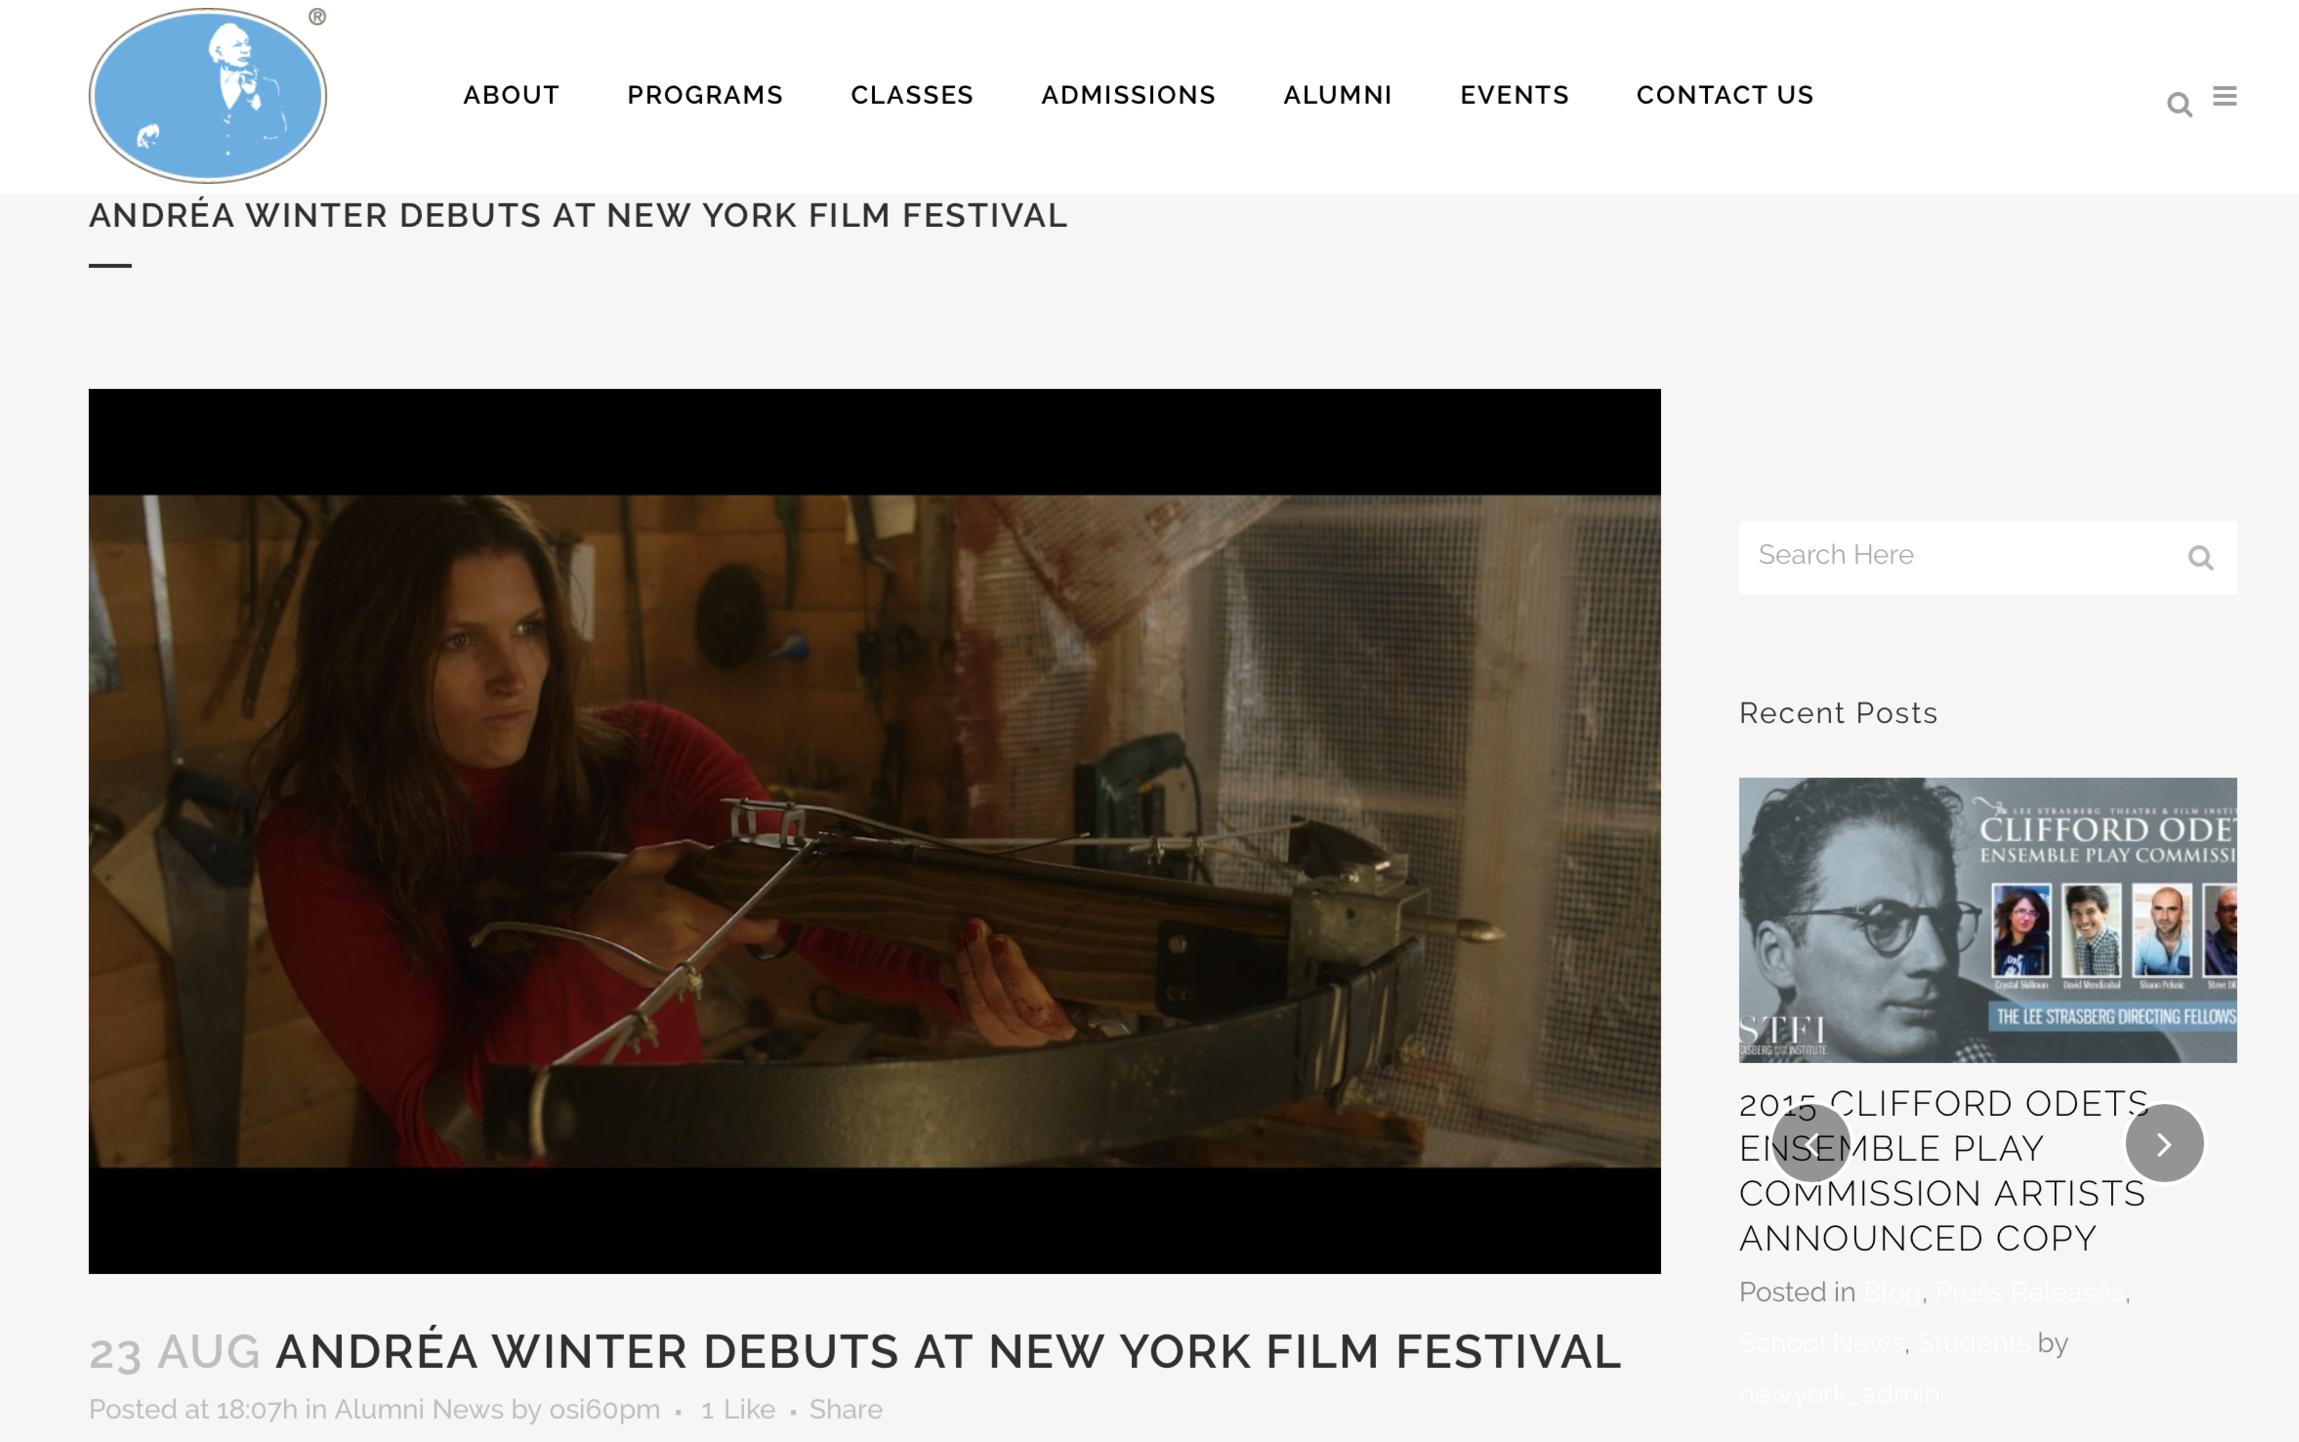 LEE STRASBERG - ANDRÉA WINTER DEBUTS AT NEW YORK FILM FESTIVAL